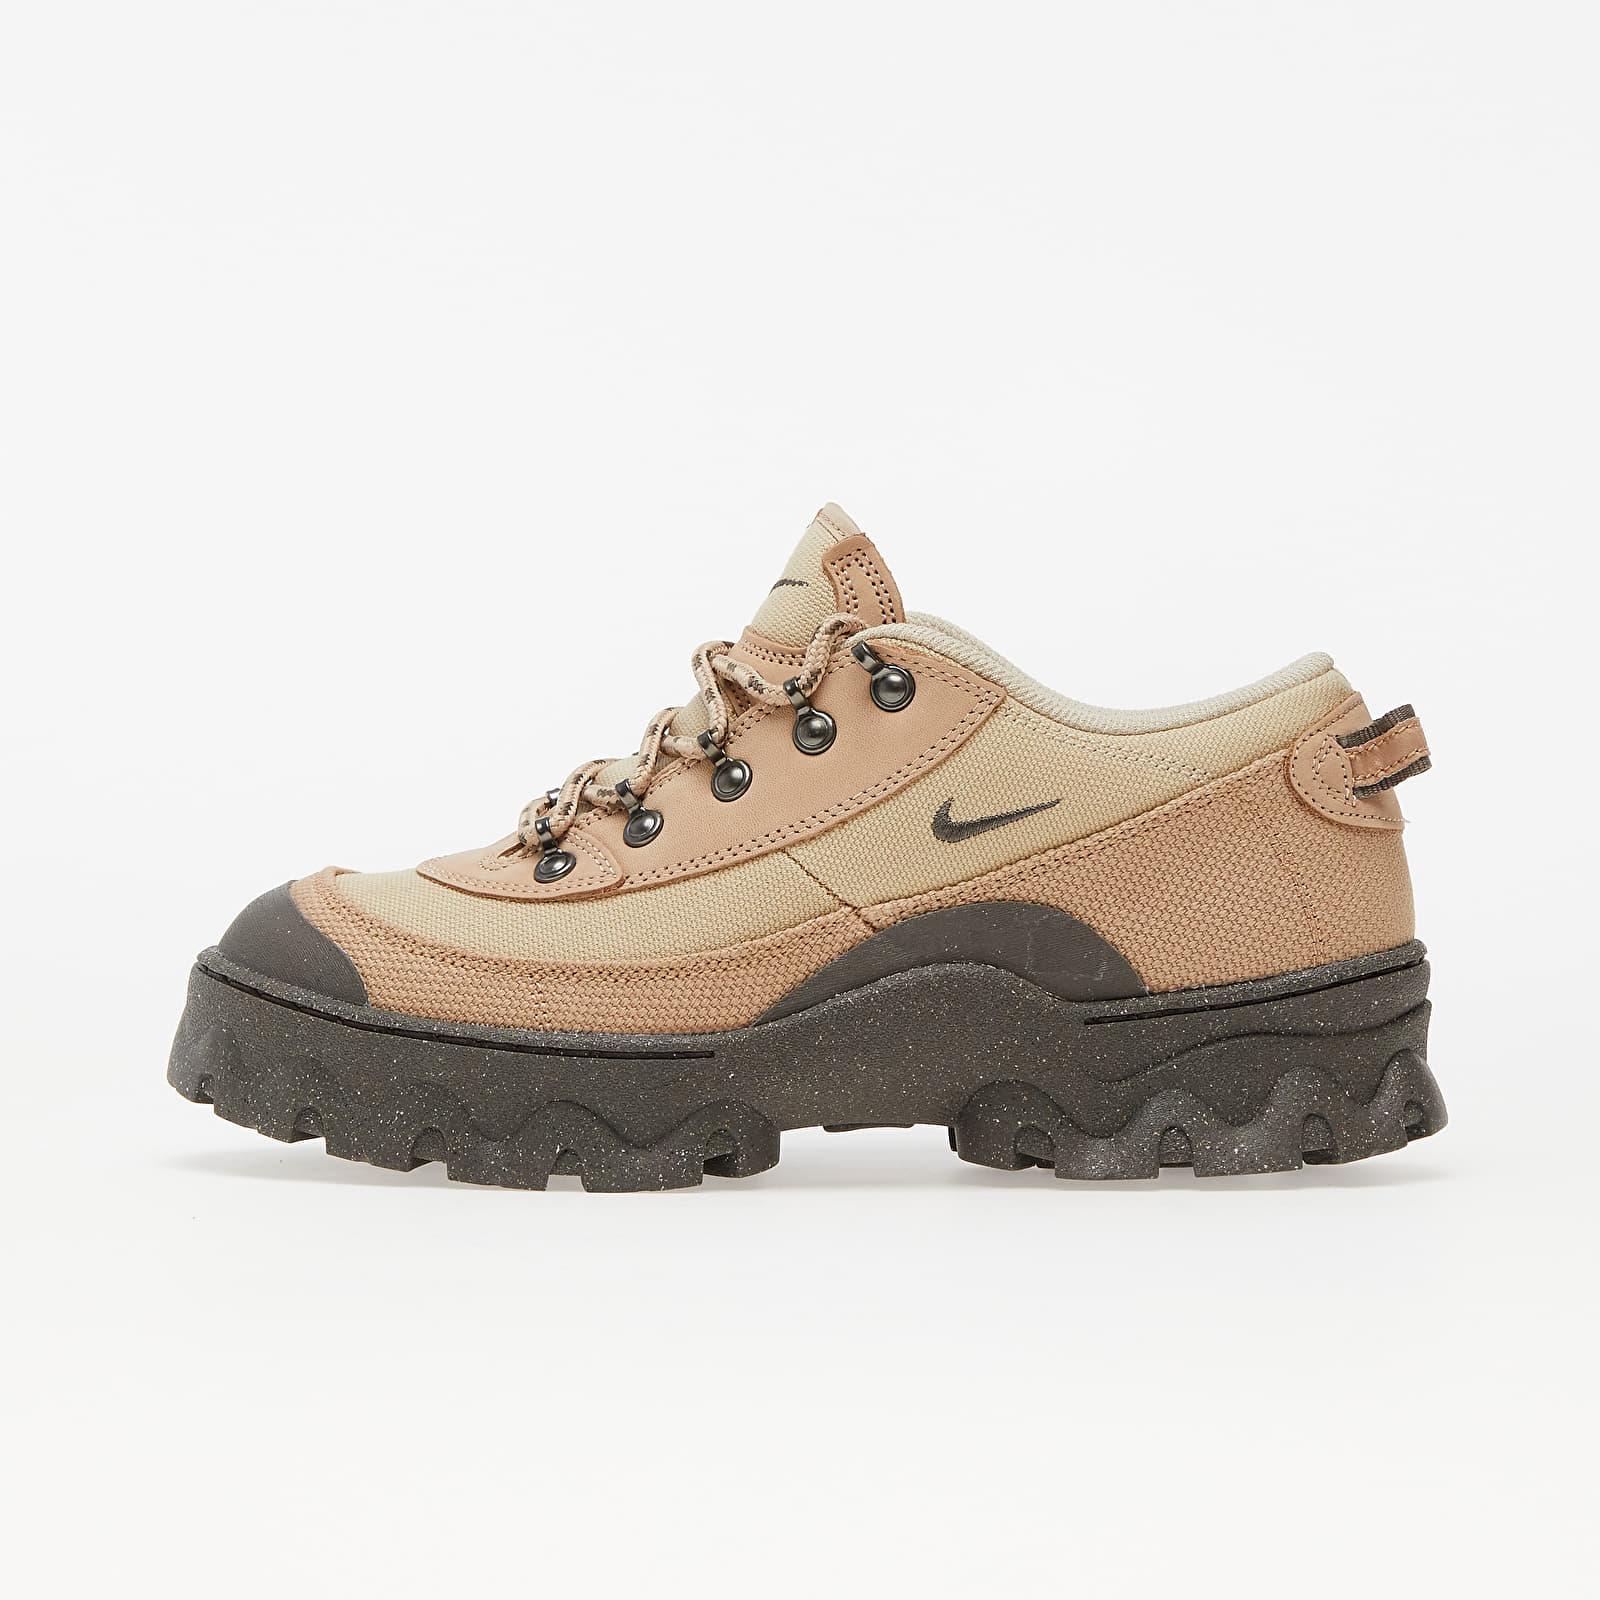 Nike Lahar Low Hemp/ Smoke-Grain-Orange